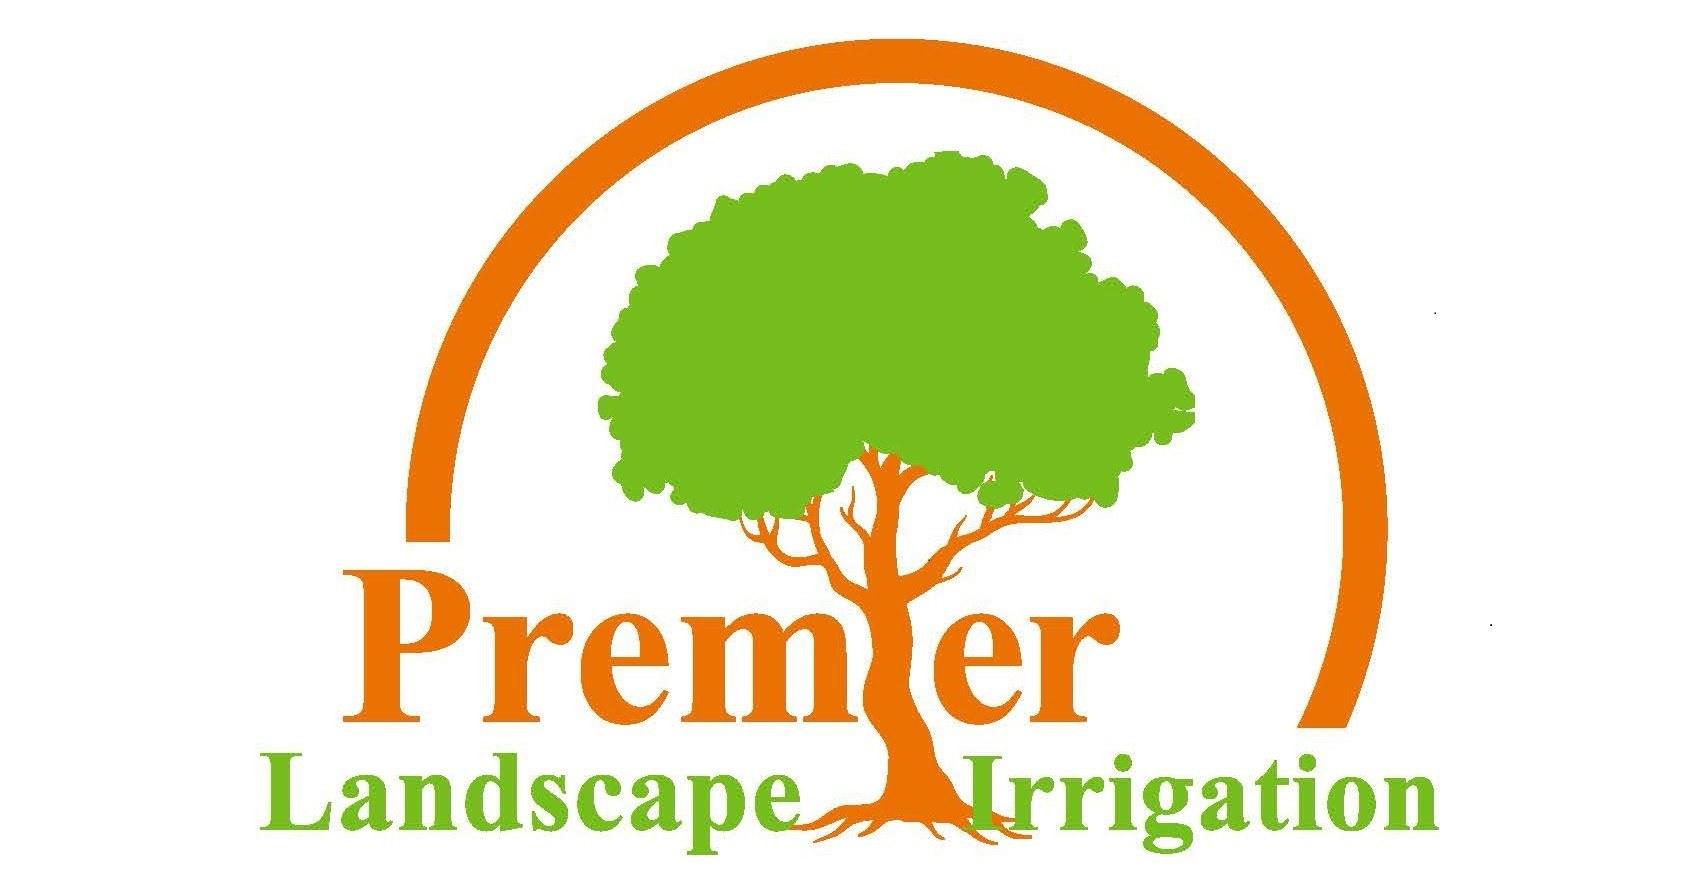 Premier Landscape & Irrigation